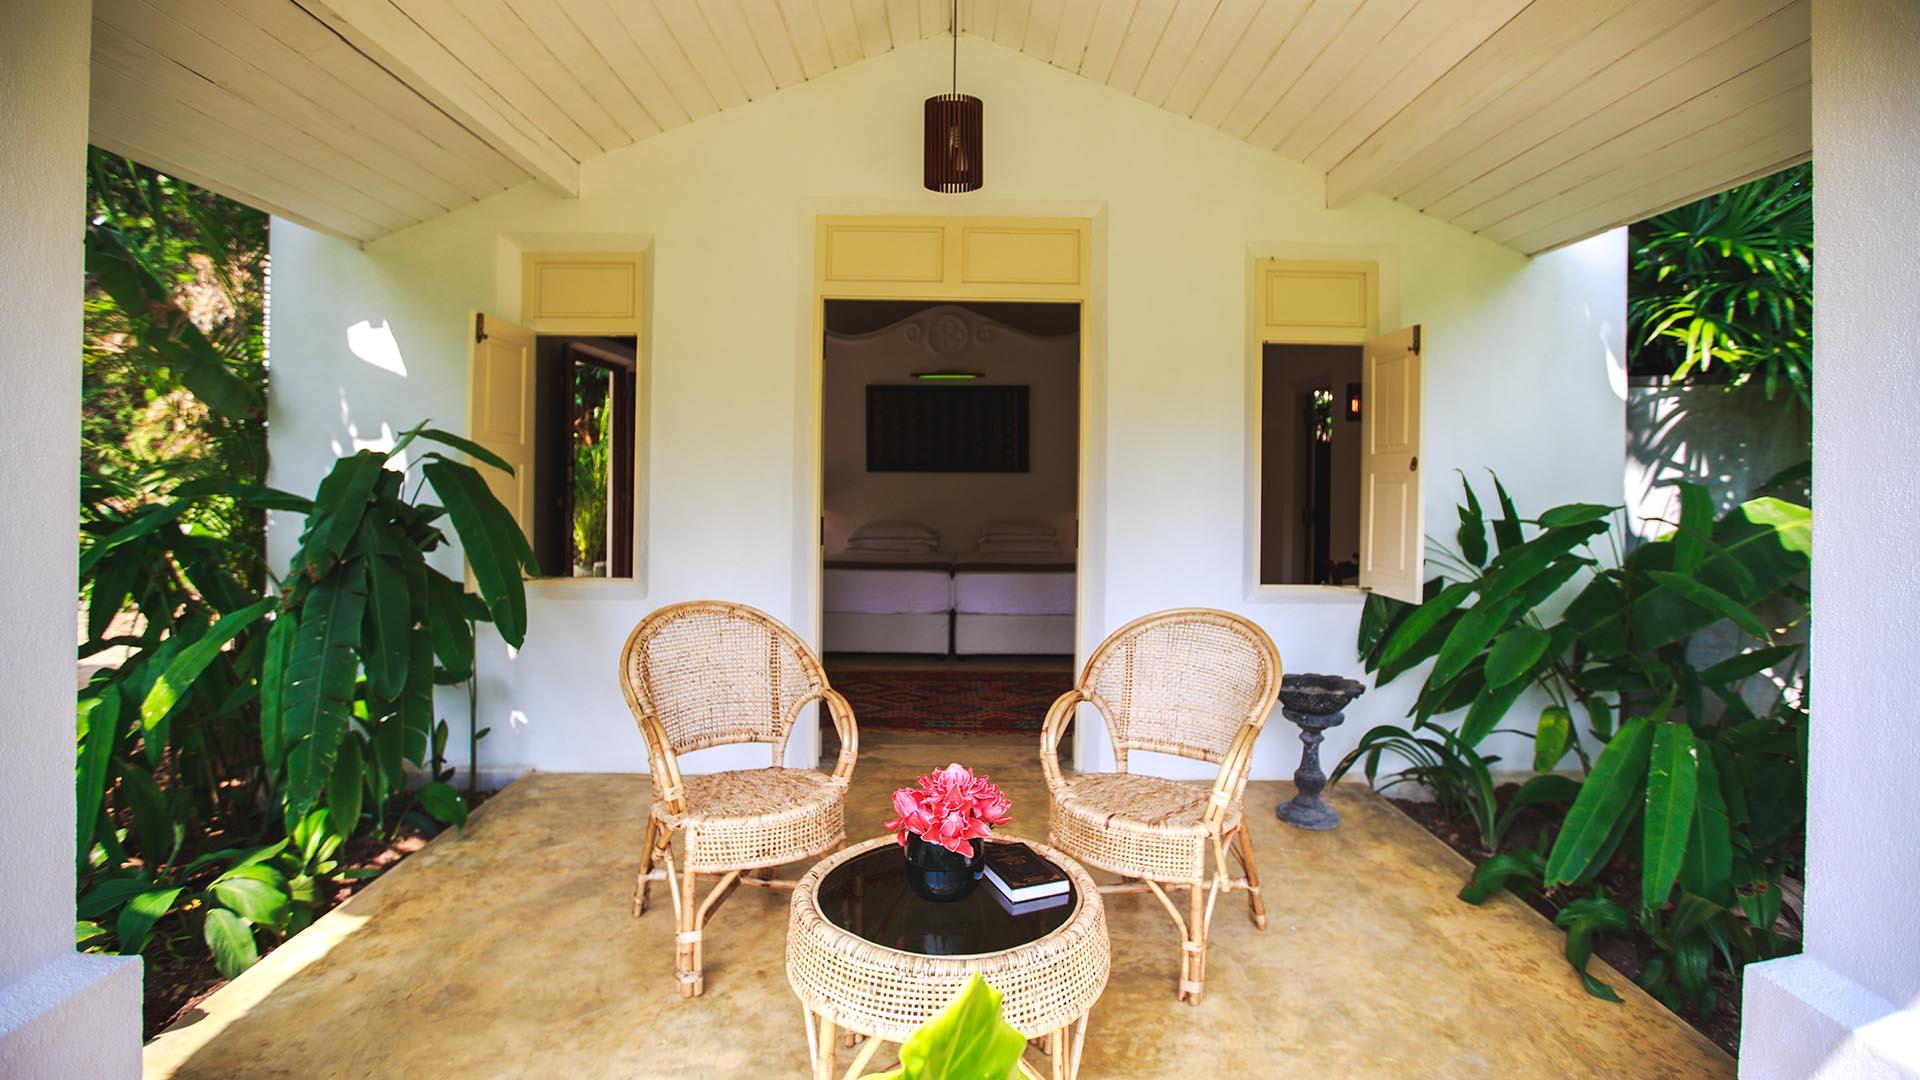 Thalduwa_villas_villa_karmel_honeymoon_suite_thalduwa_villas_villa_karmel copy 3.jpg